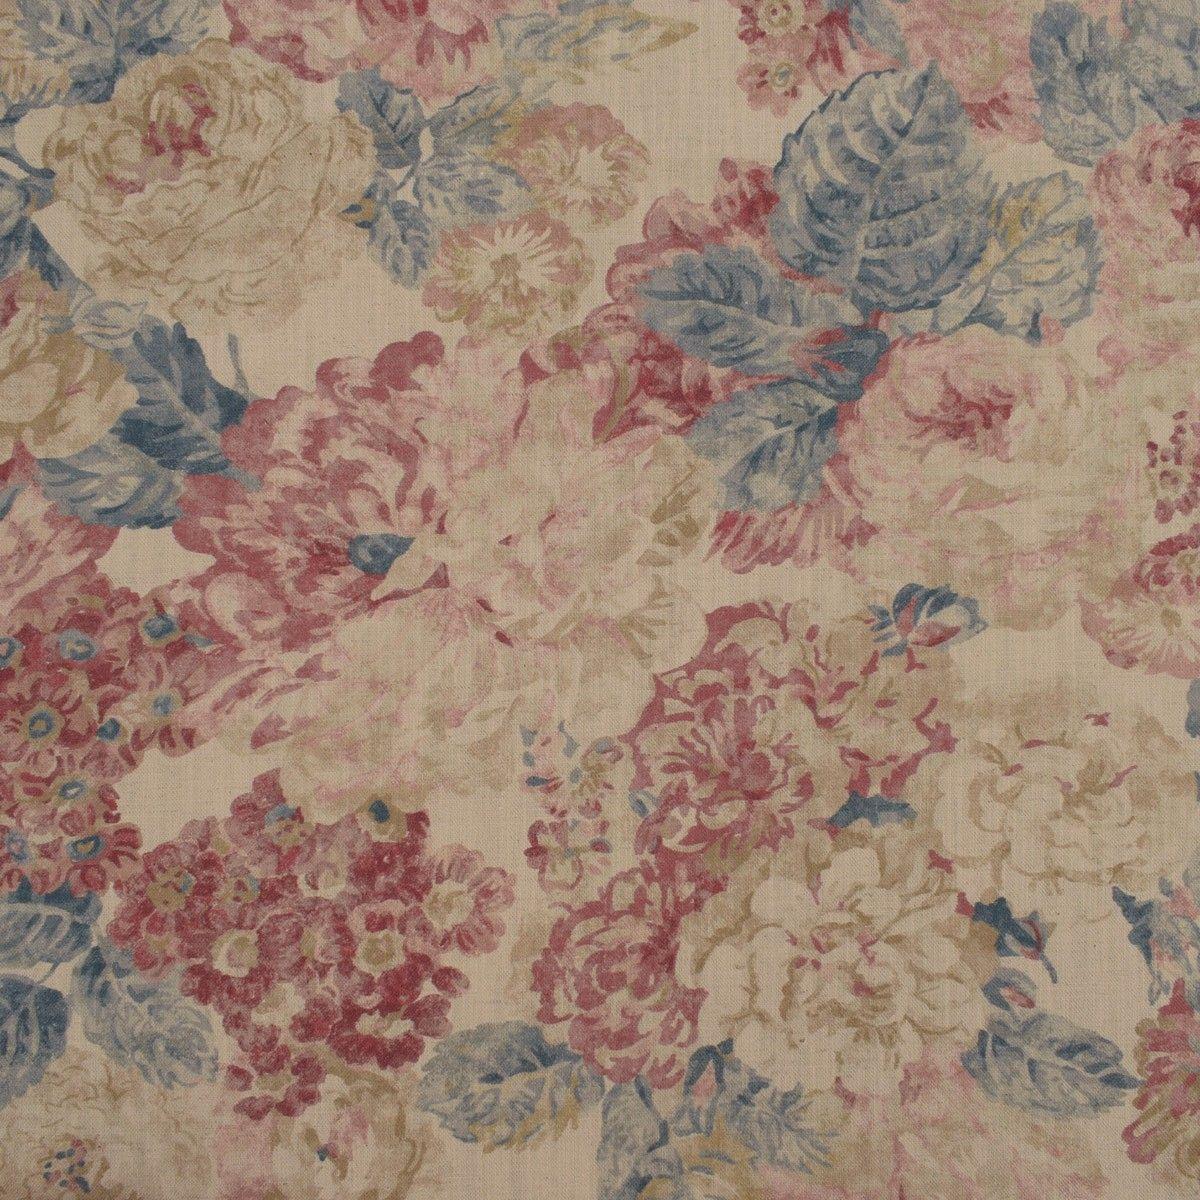 Linen Union Liseron Rouge Fabric Blinds Large Scale Floral